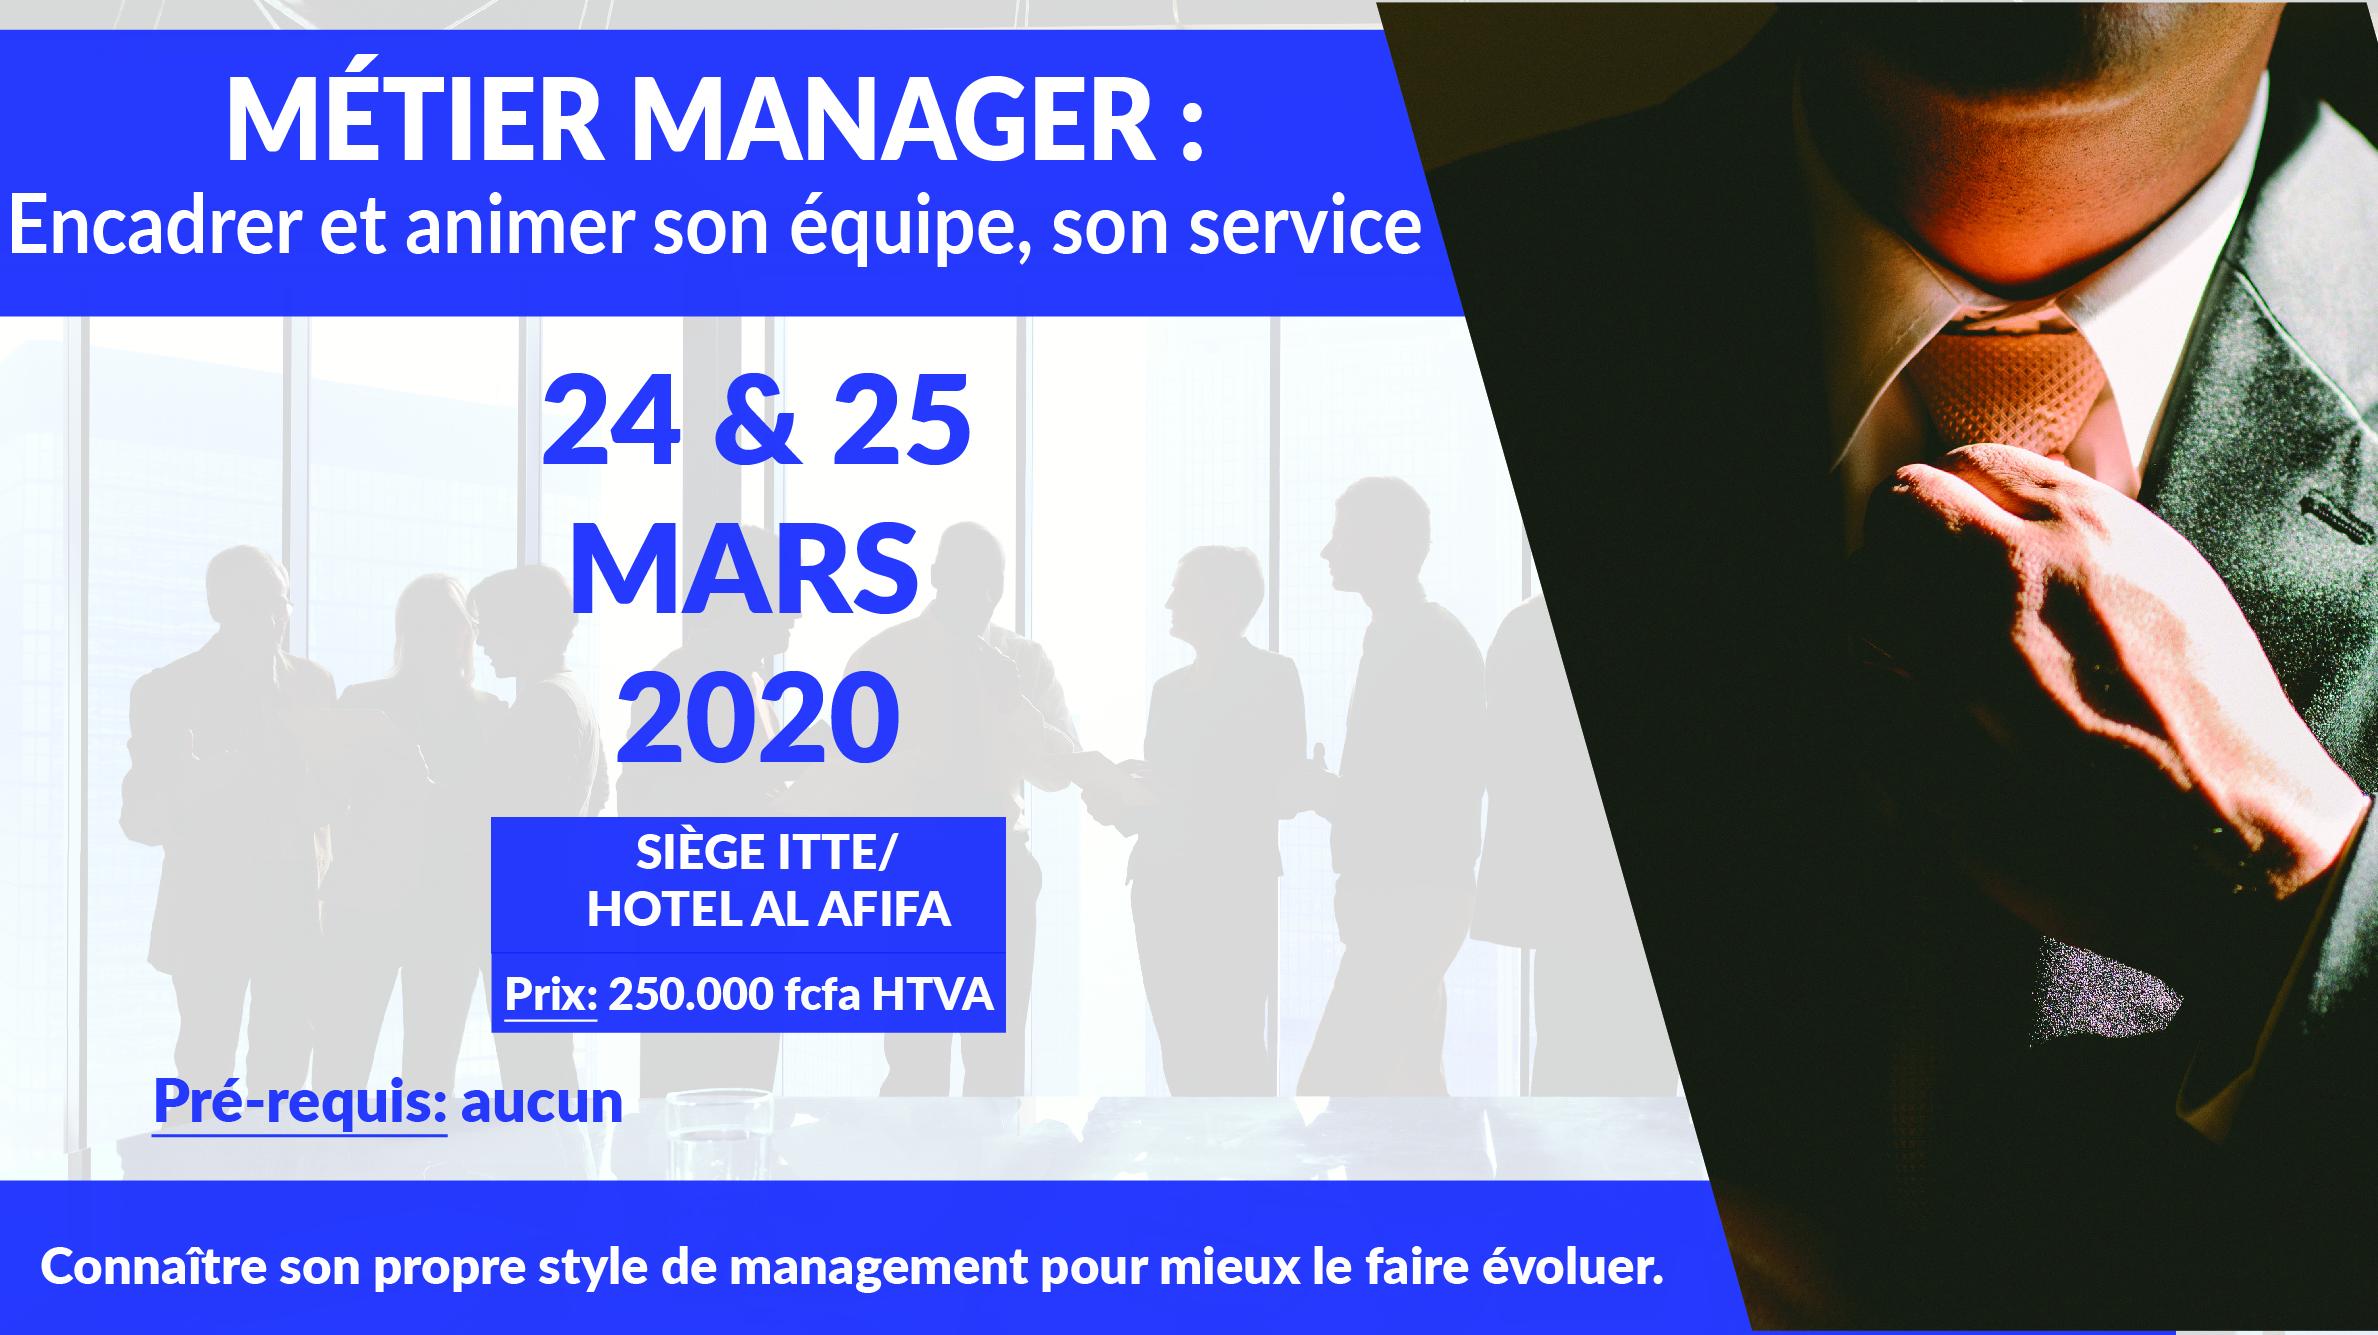 metier_manager_032020